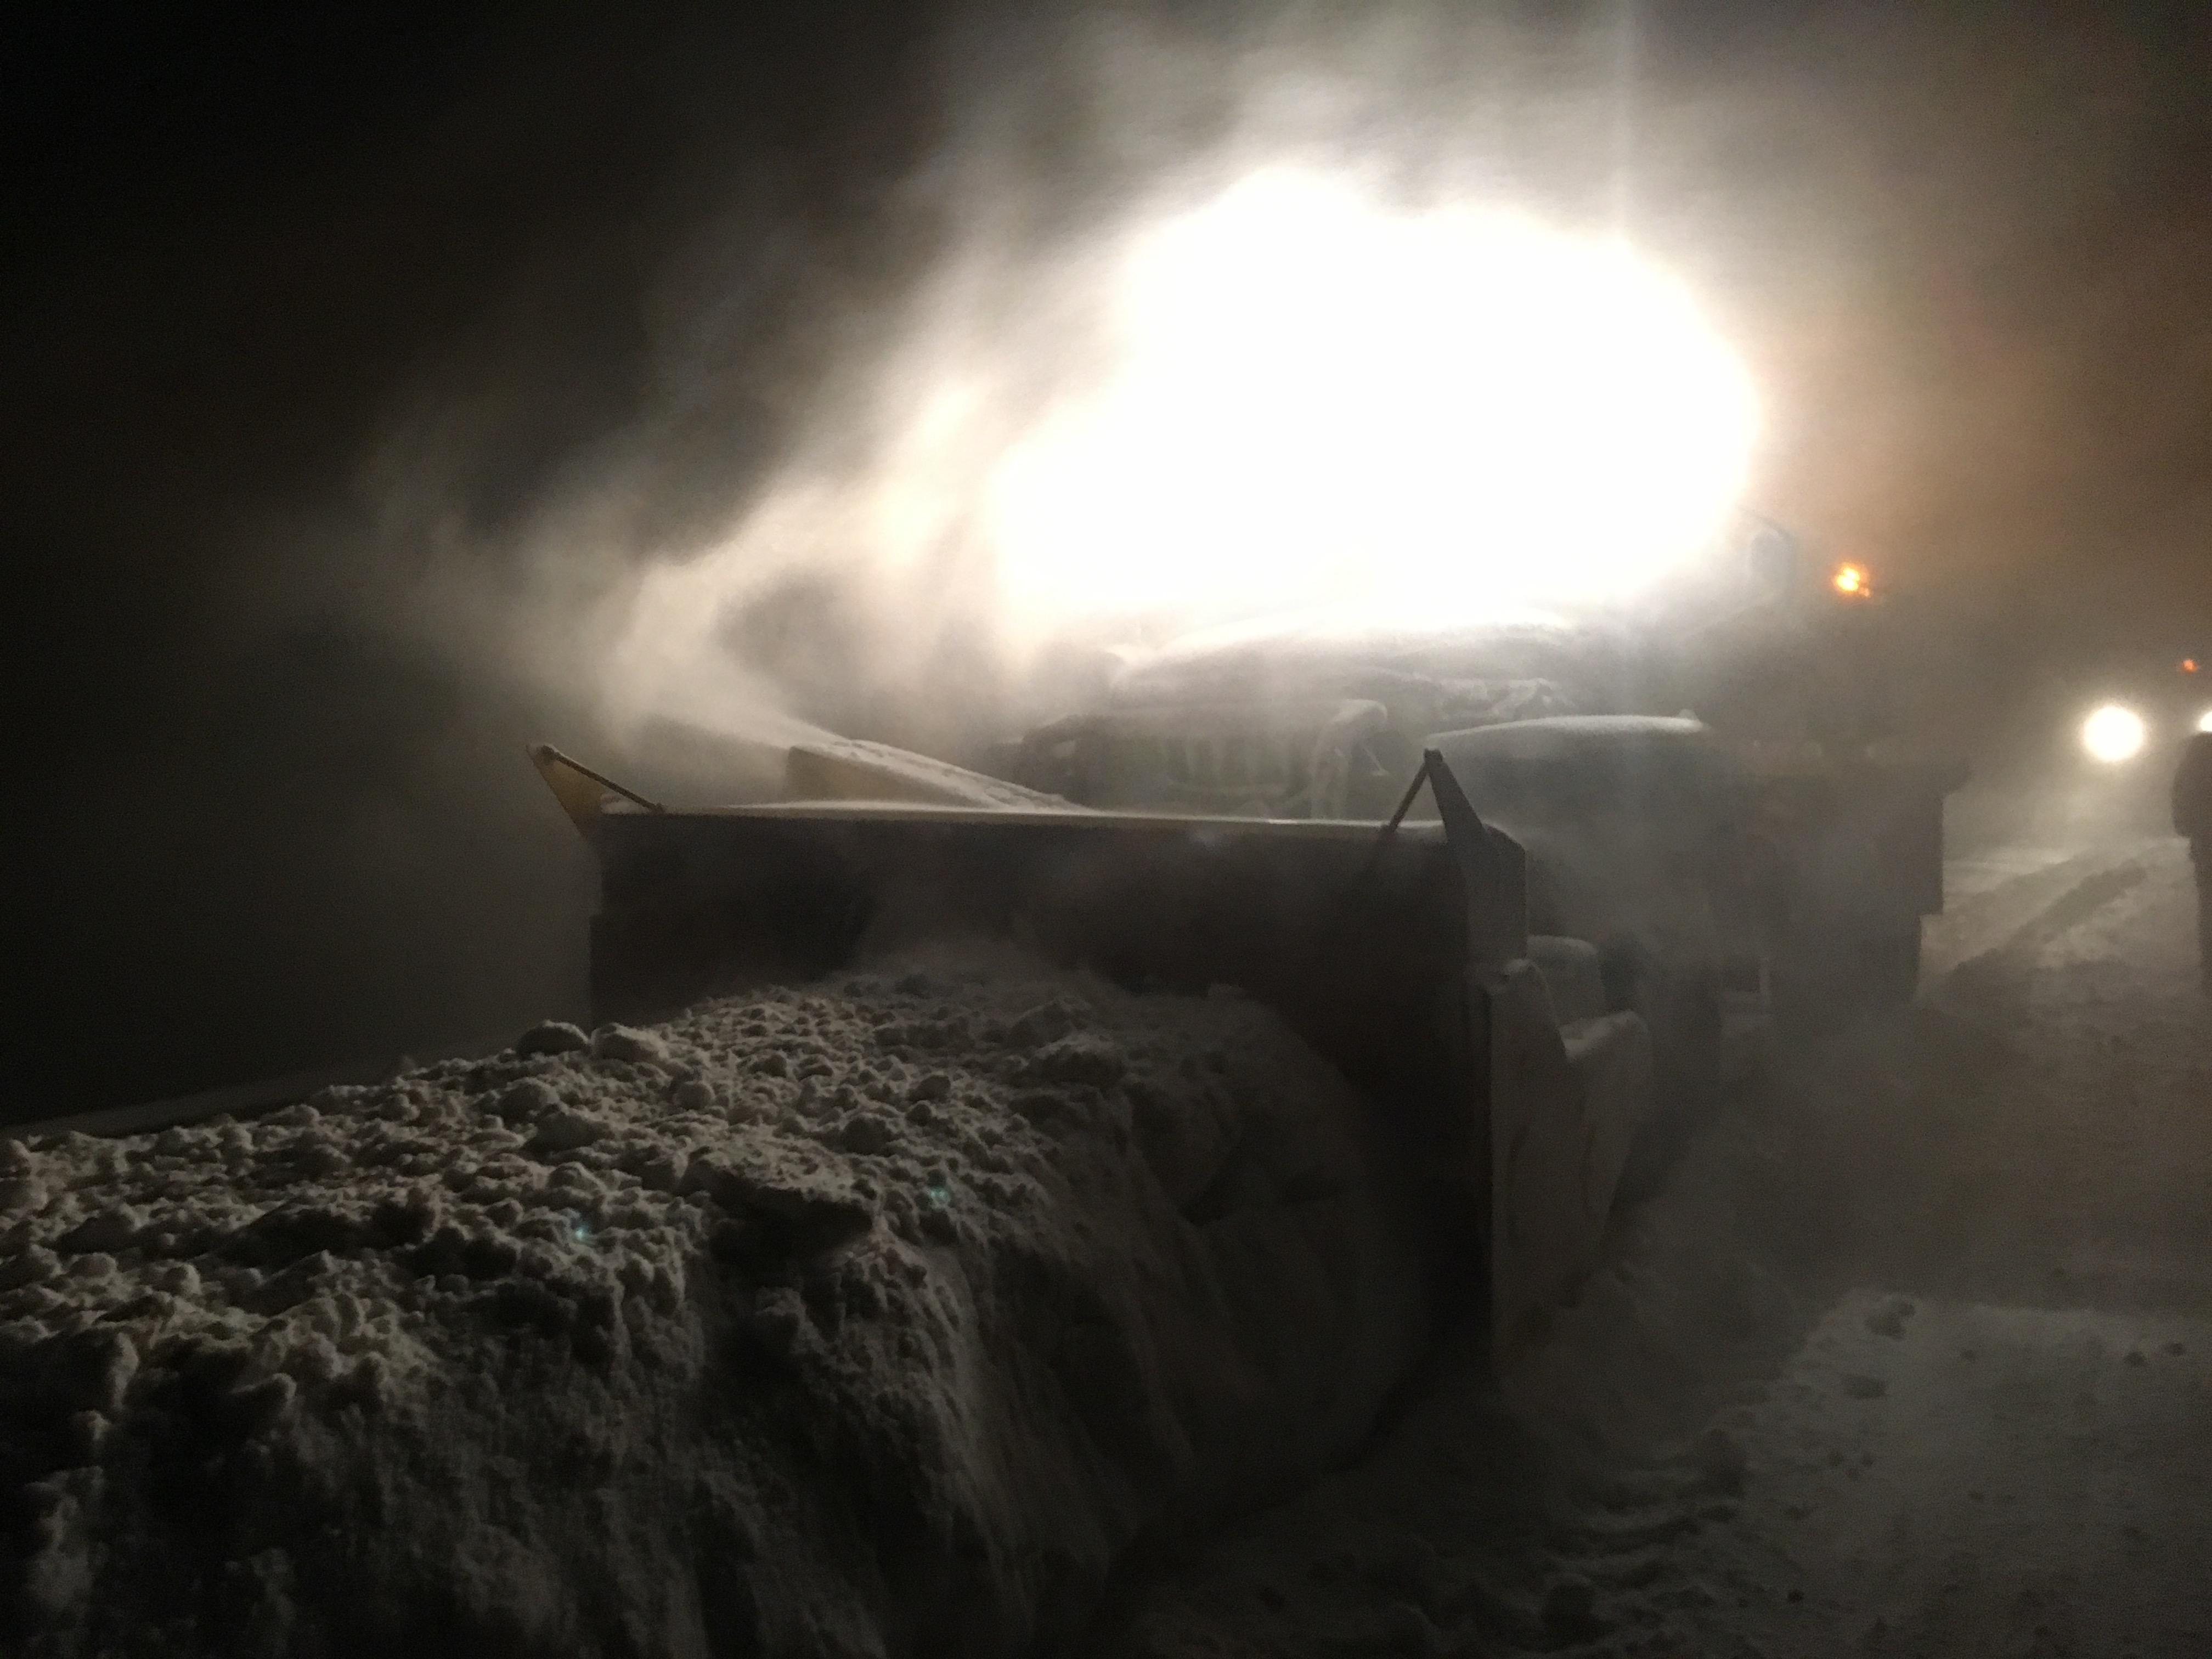 Ситуация на дорогах Харьковщины (фото, видео)